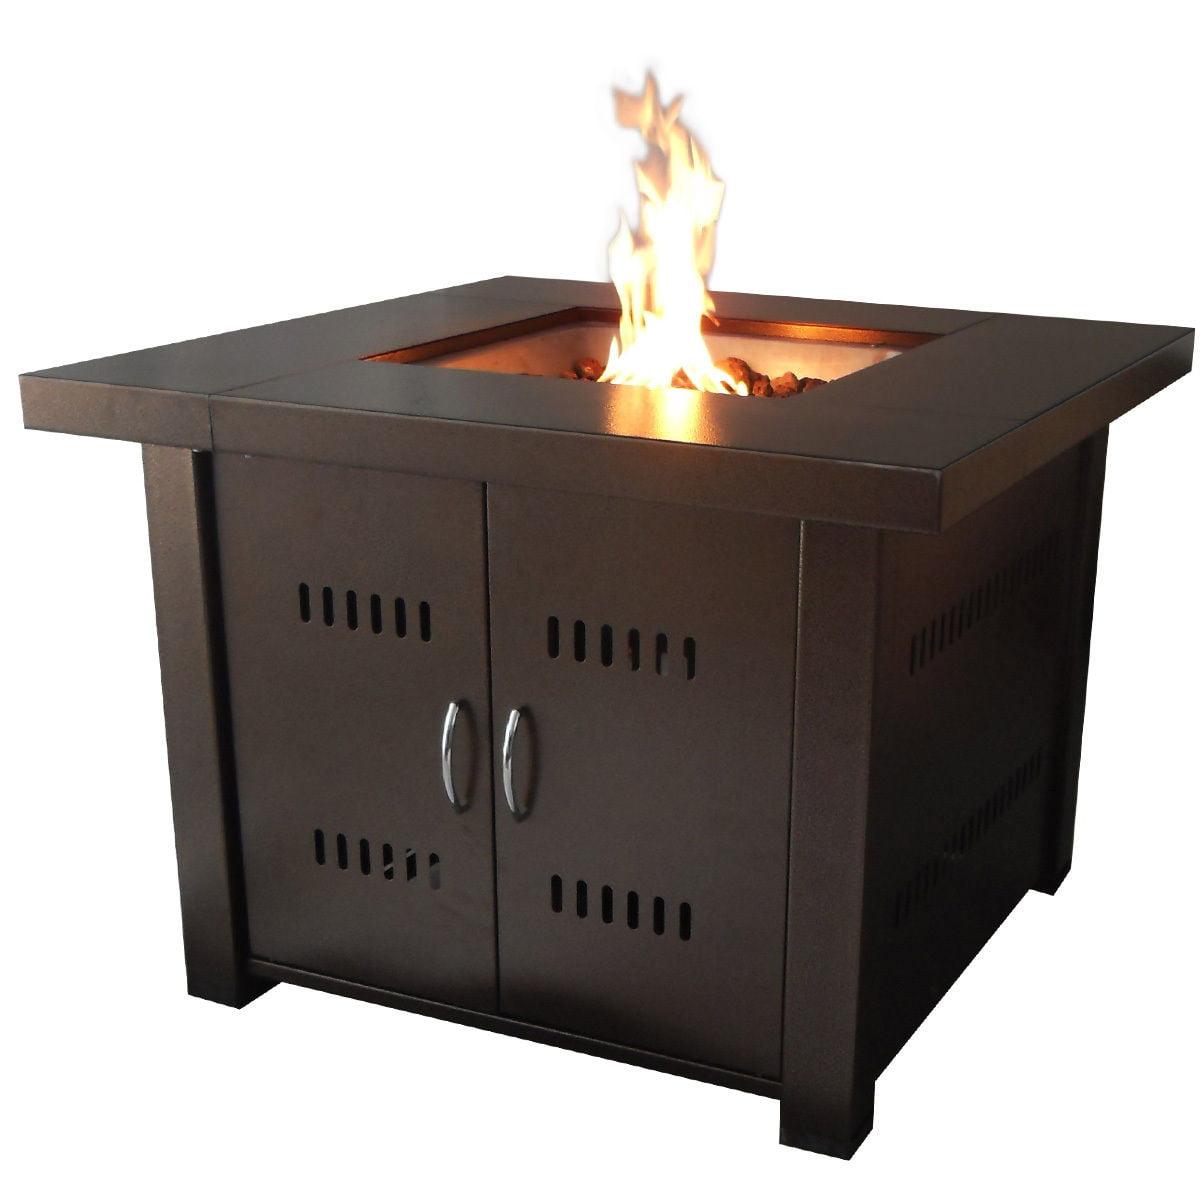 Costway Outdoor Fire Pit Table Patio Deck Backyard Heater Fireplace Propane LP Furniture